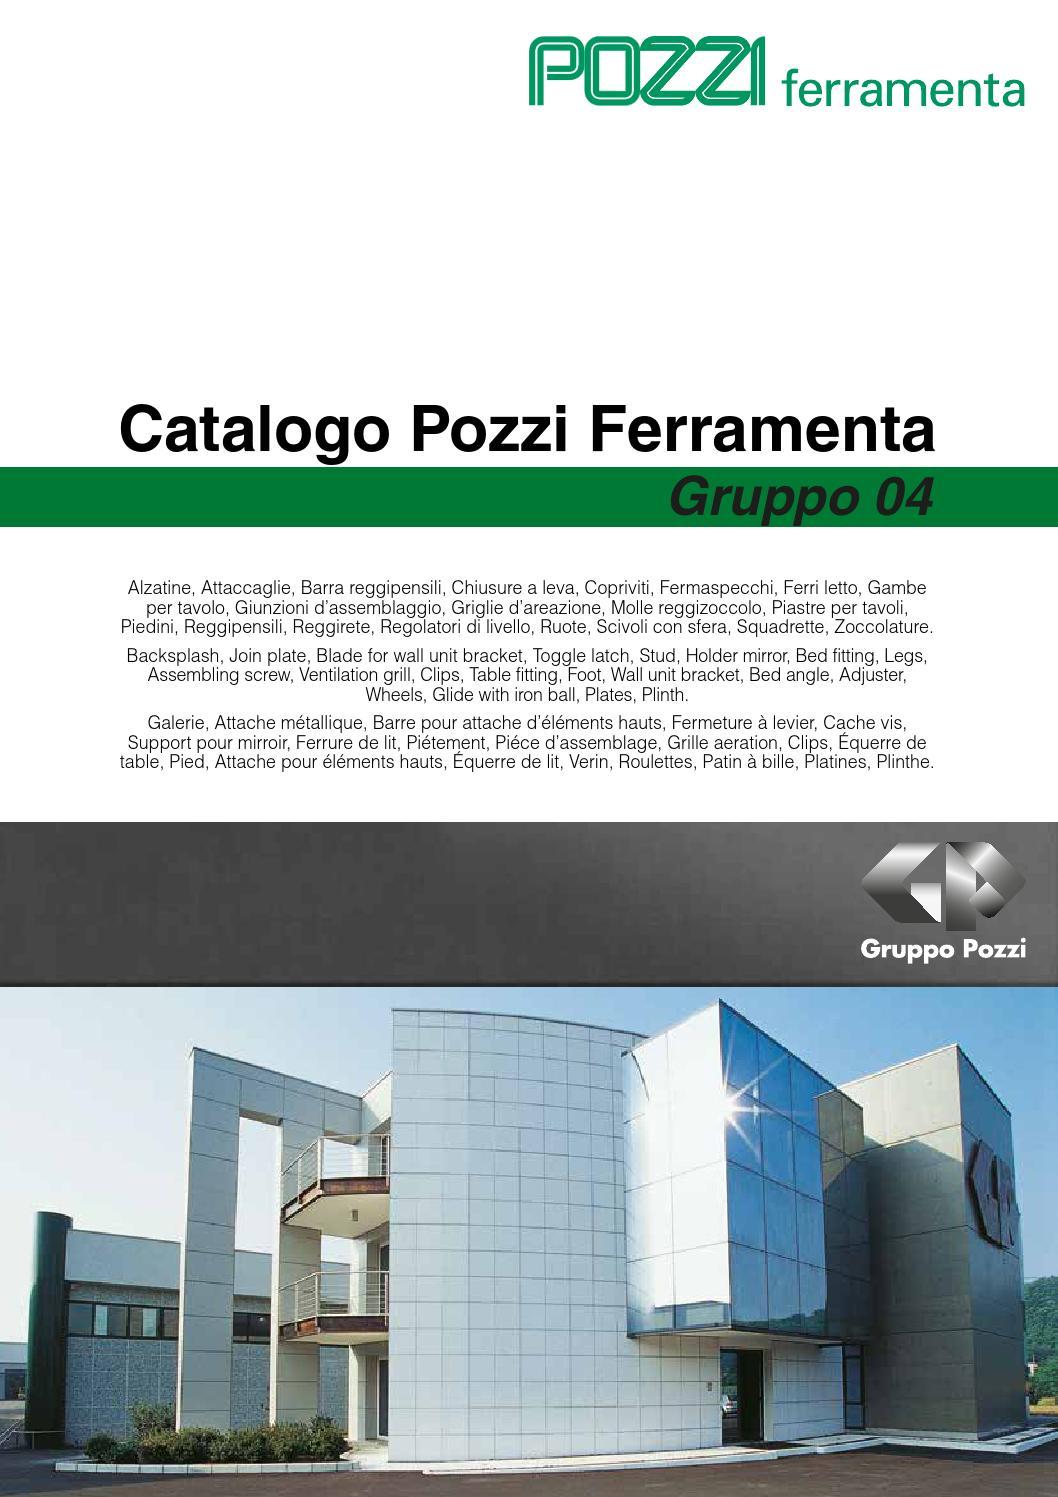 Pozzi ferramenta gruppo 04 by Minitec sas - Issuu